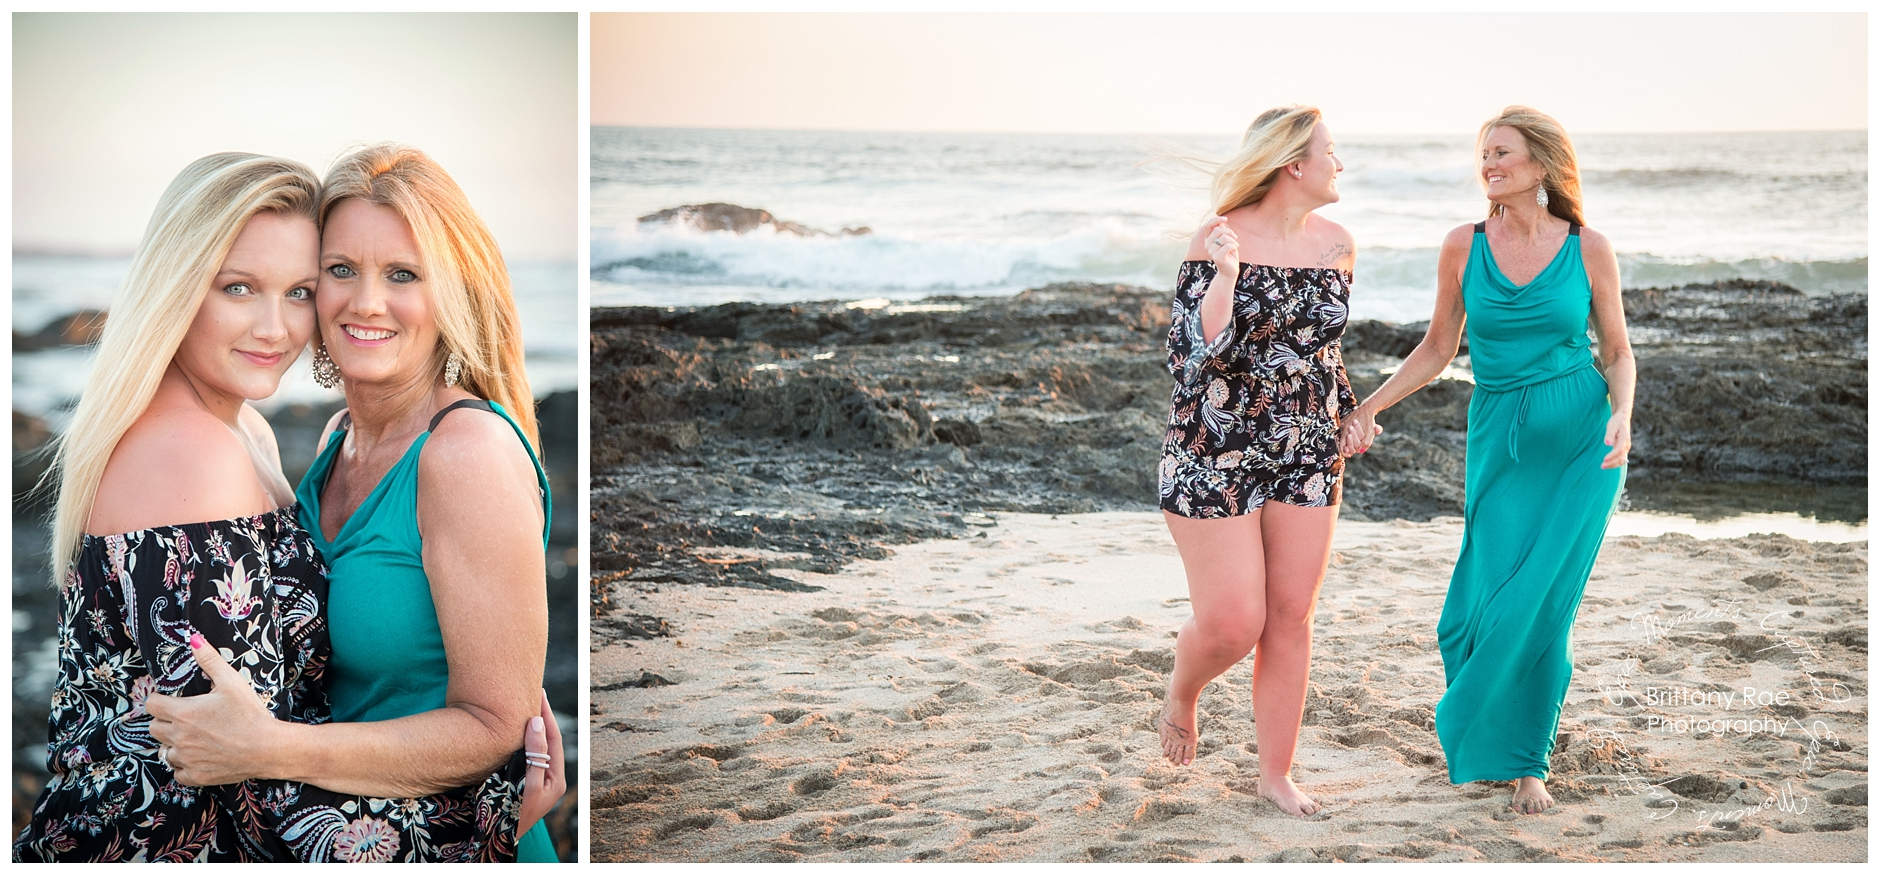 Mother Daughter Portraits in Costa Rica, Tamarindo Wedding Photographers - Playa Langosta Sunset Portraits